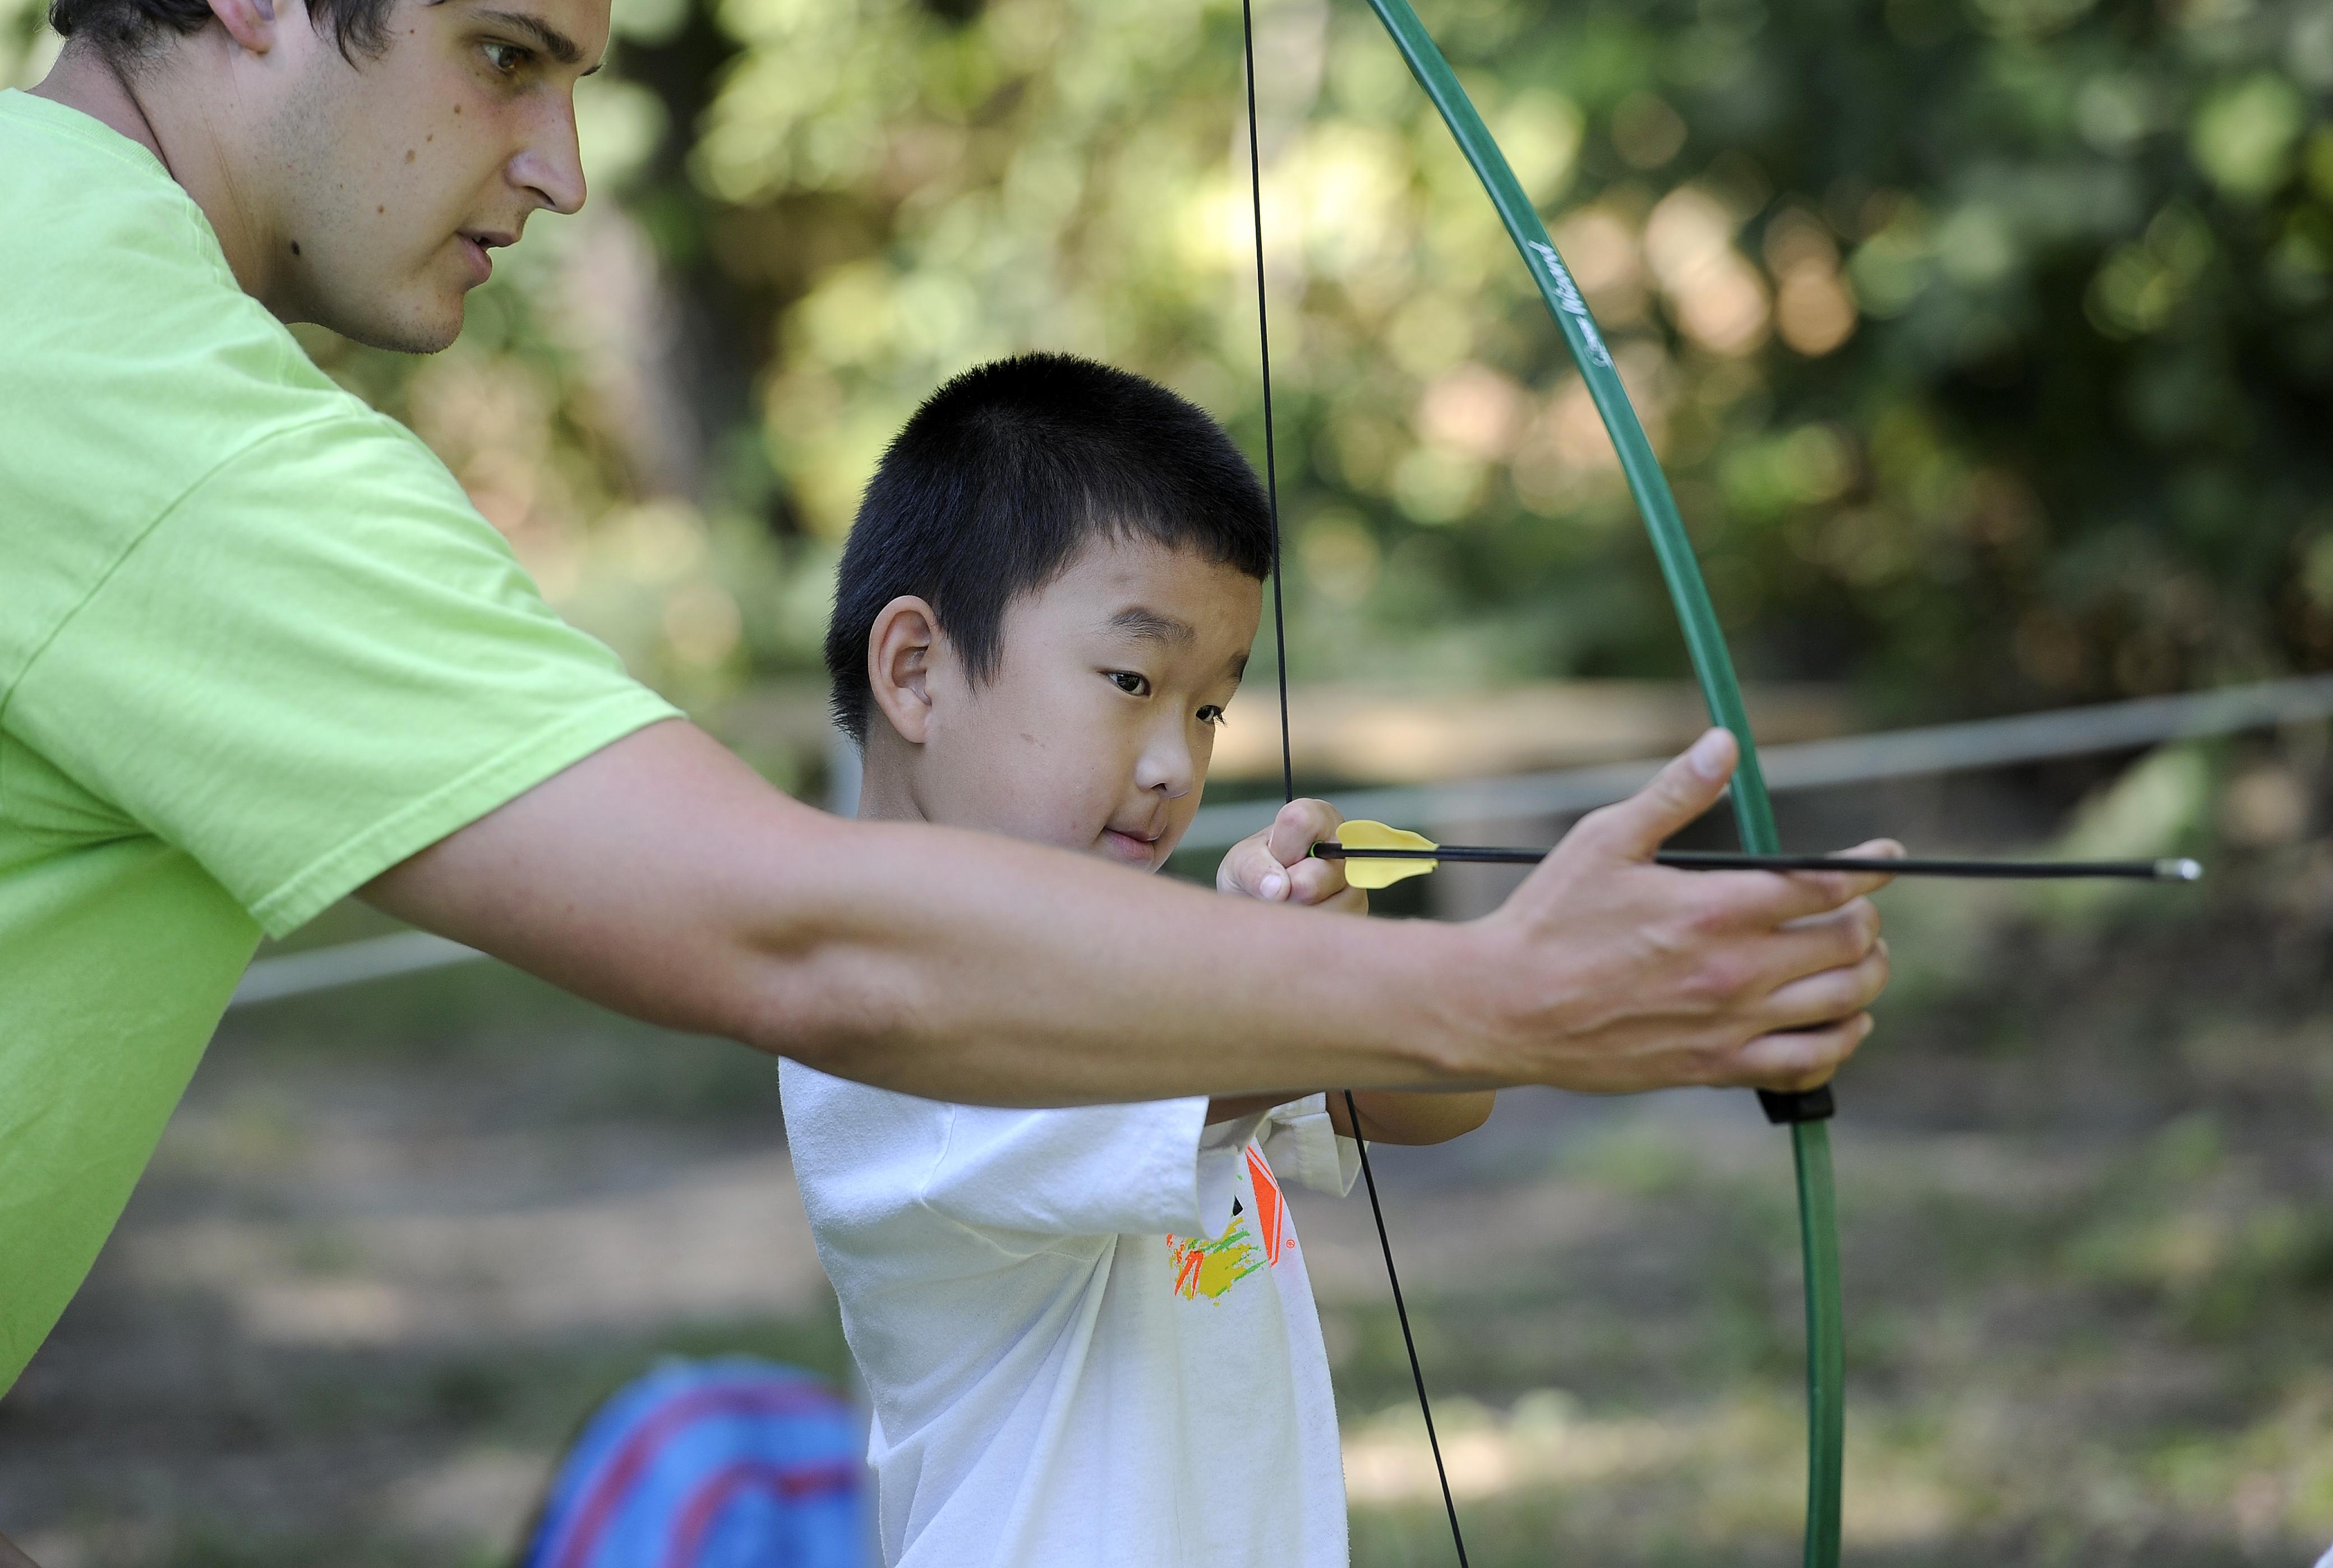 YMCA Camp Birkett, July 28, 2015.